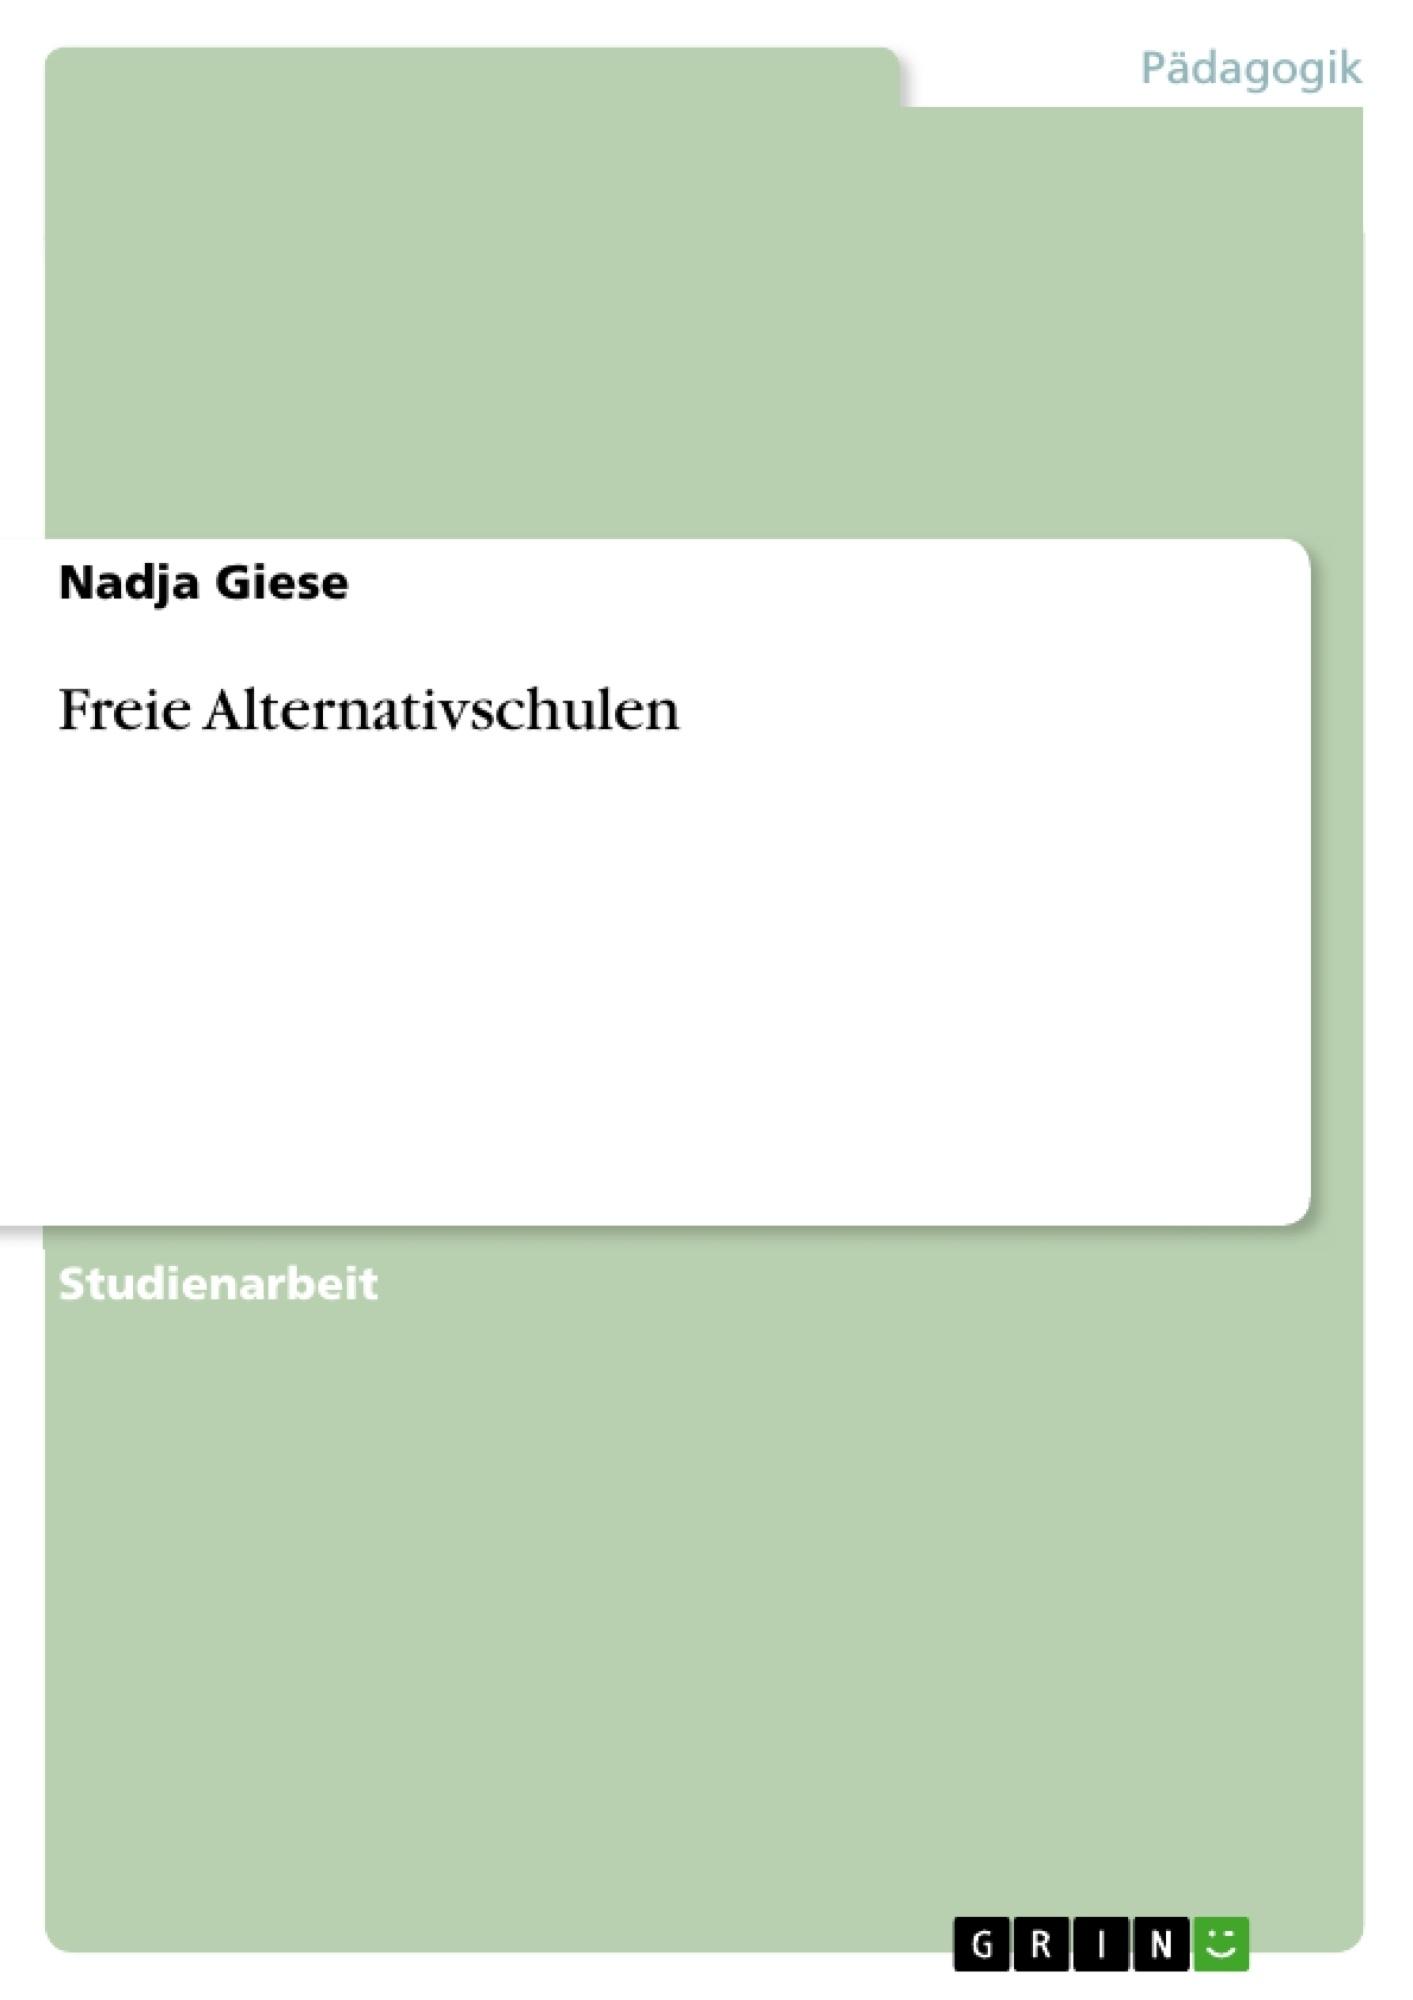 Titel: Freie Alternativschulen